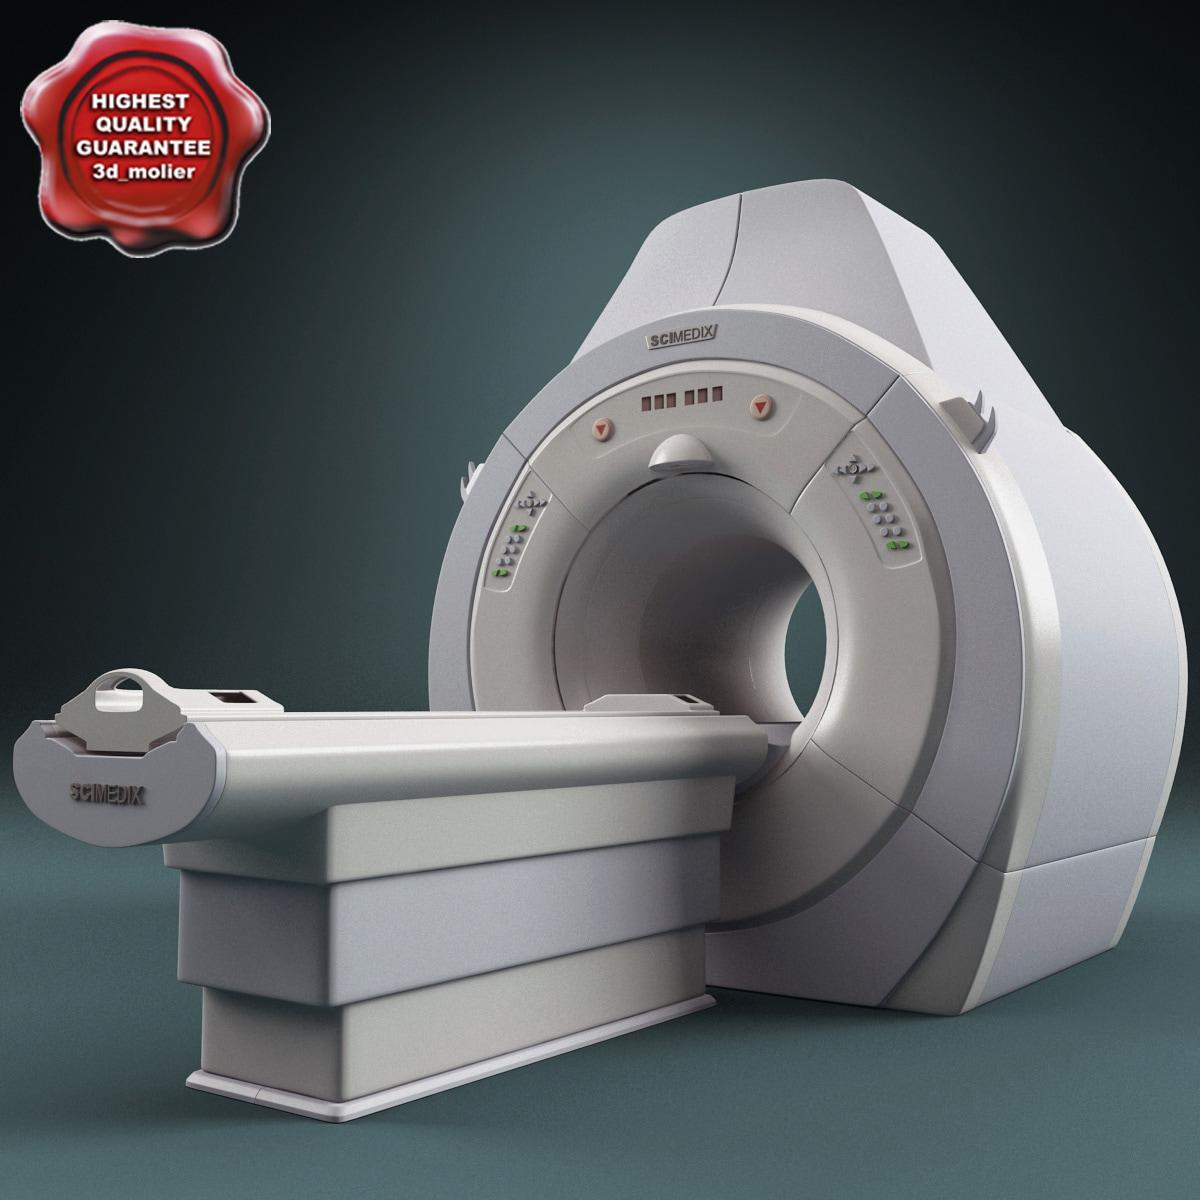 ct scanner scimedix mrt 3d model